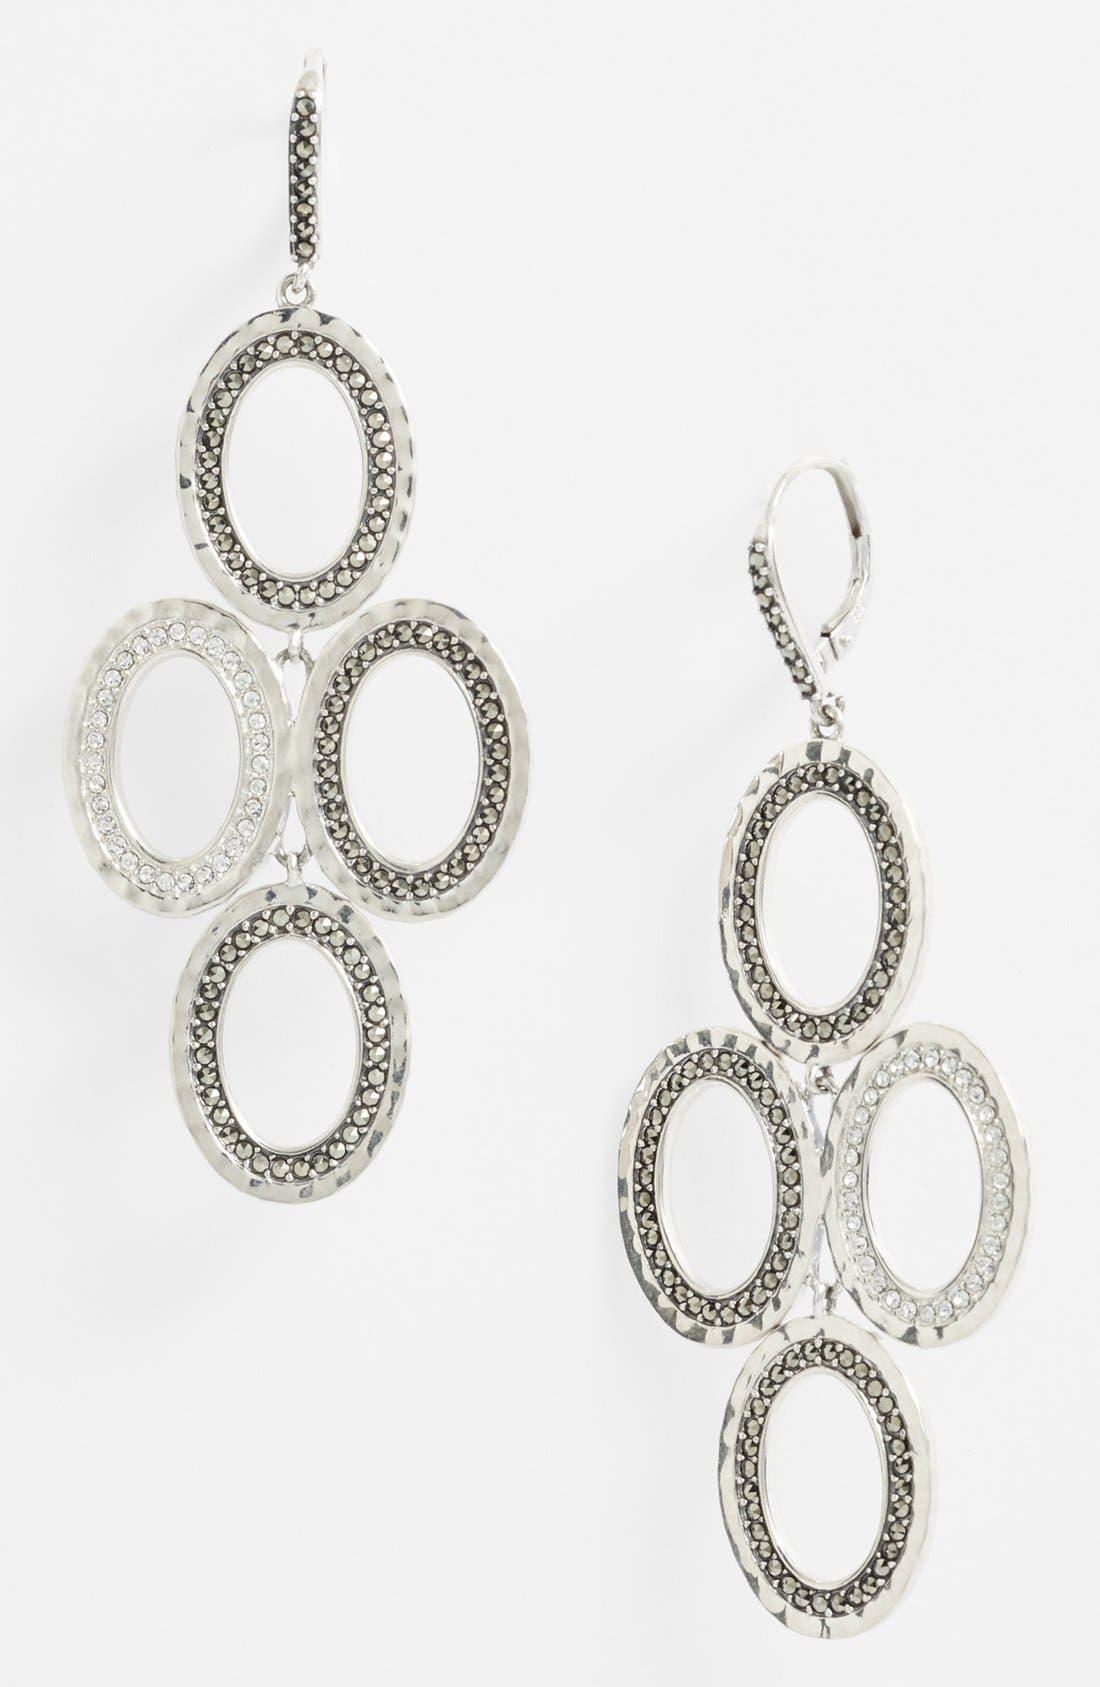 Alternate Image 1 Selected - Judith Jack 'Halo' Oval Chandelier Earrings